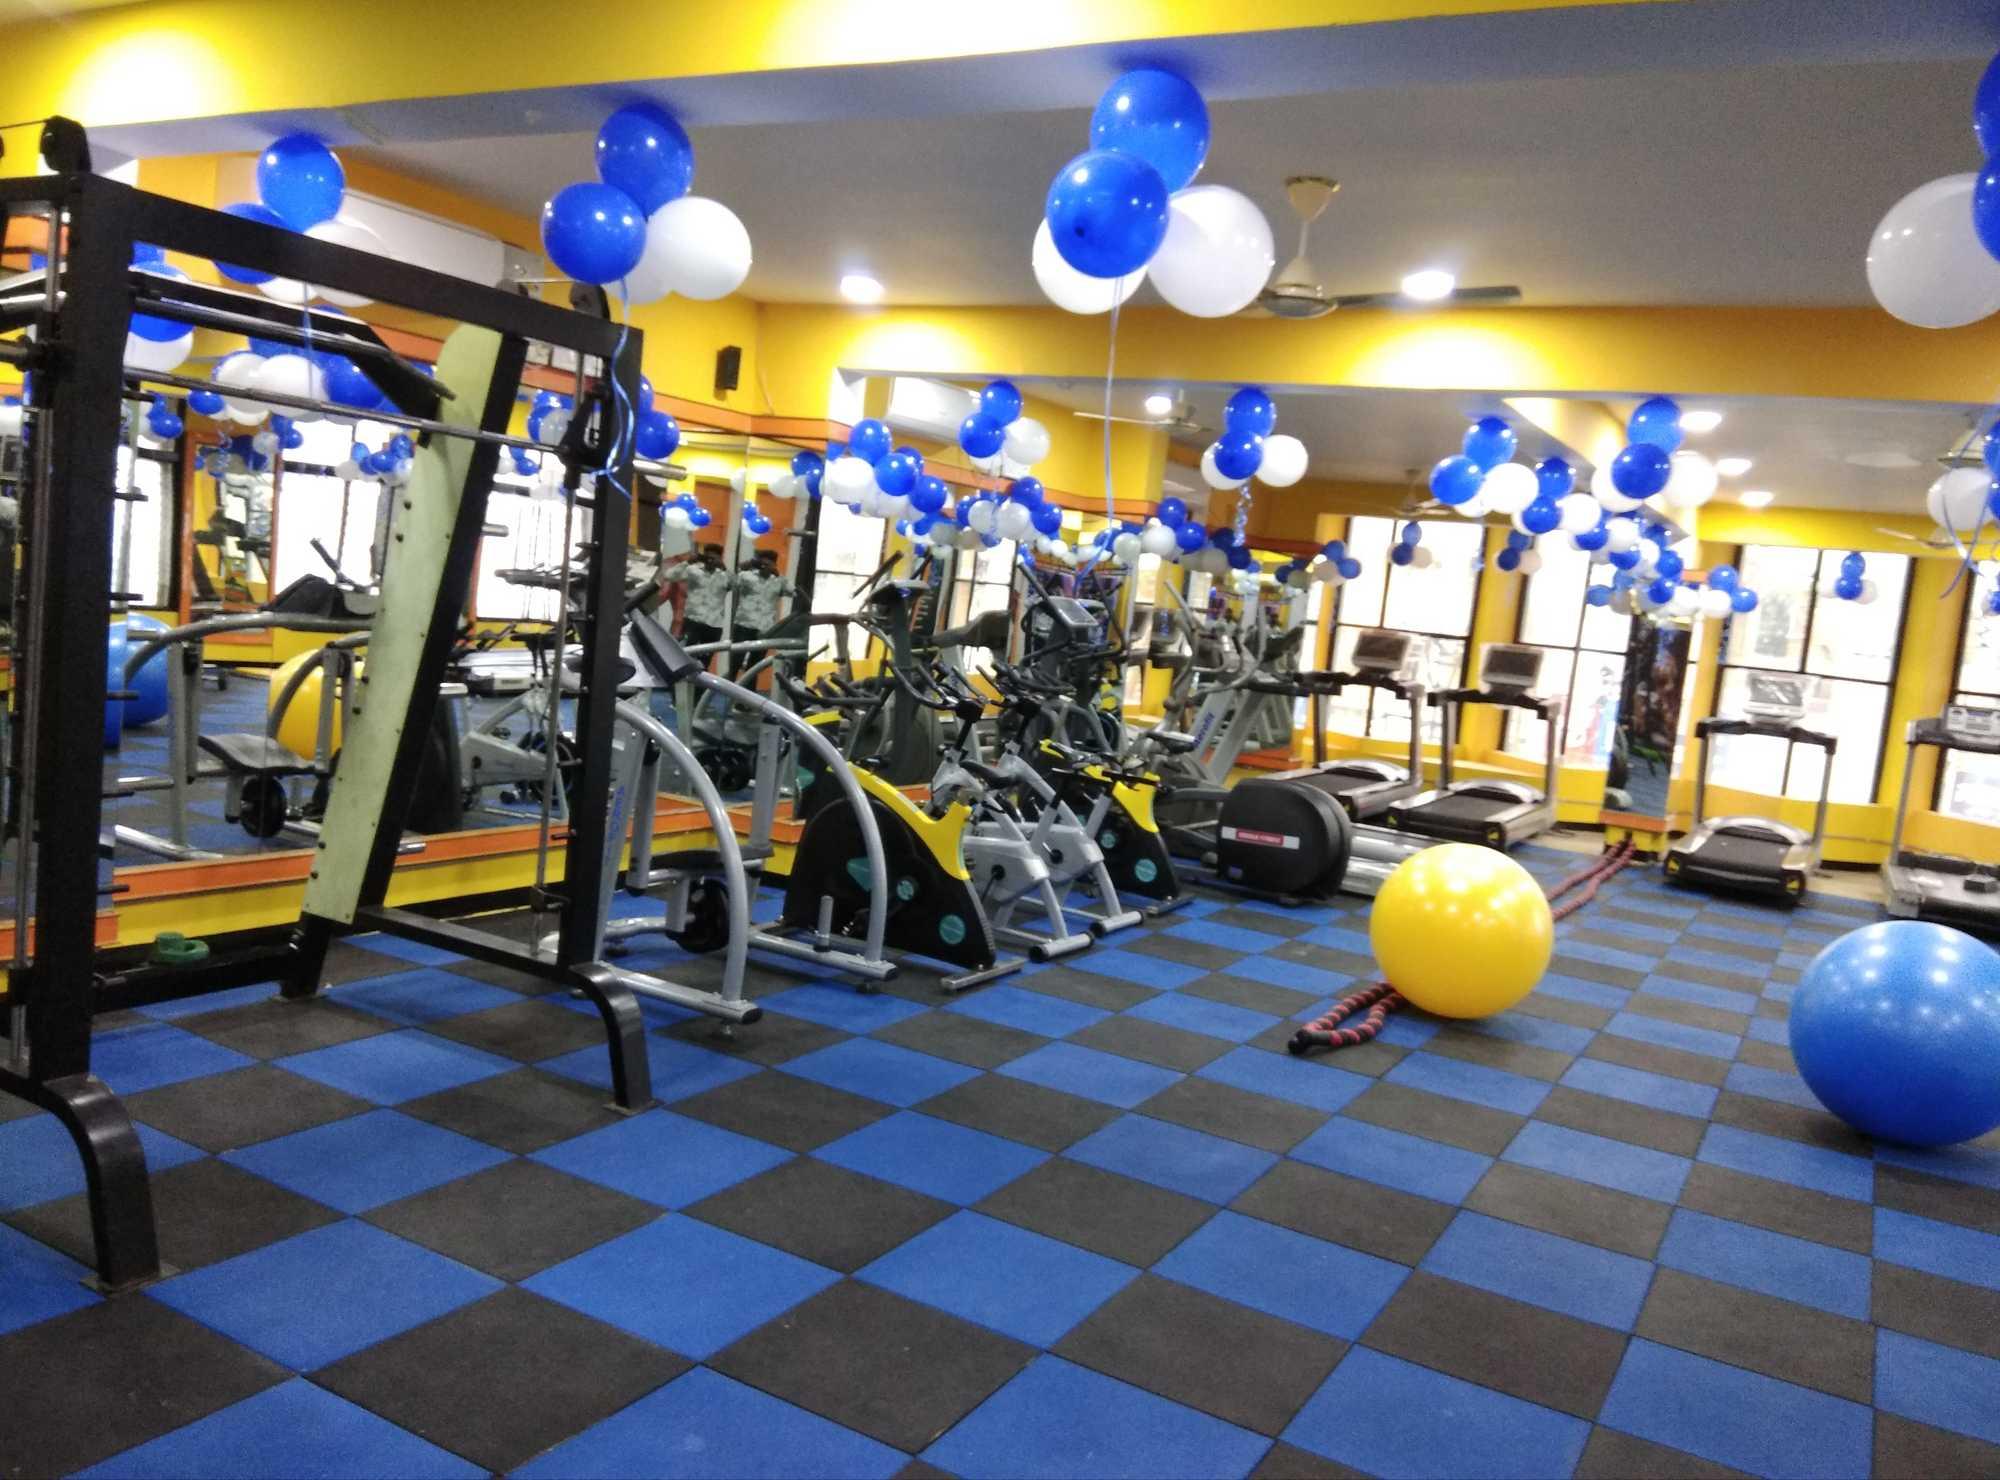 Spring Gym Health Studio, M G Road - Gyms in Warangal - Justdial